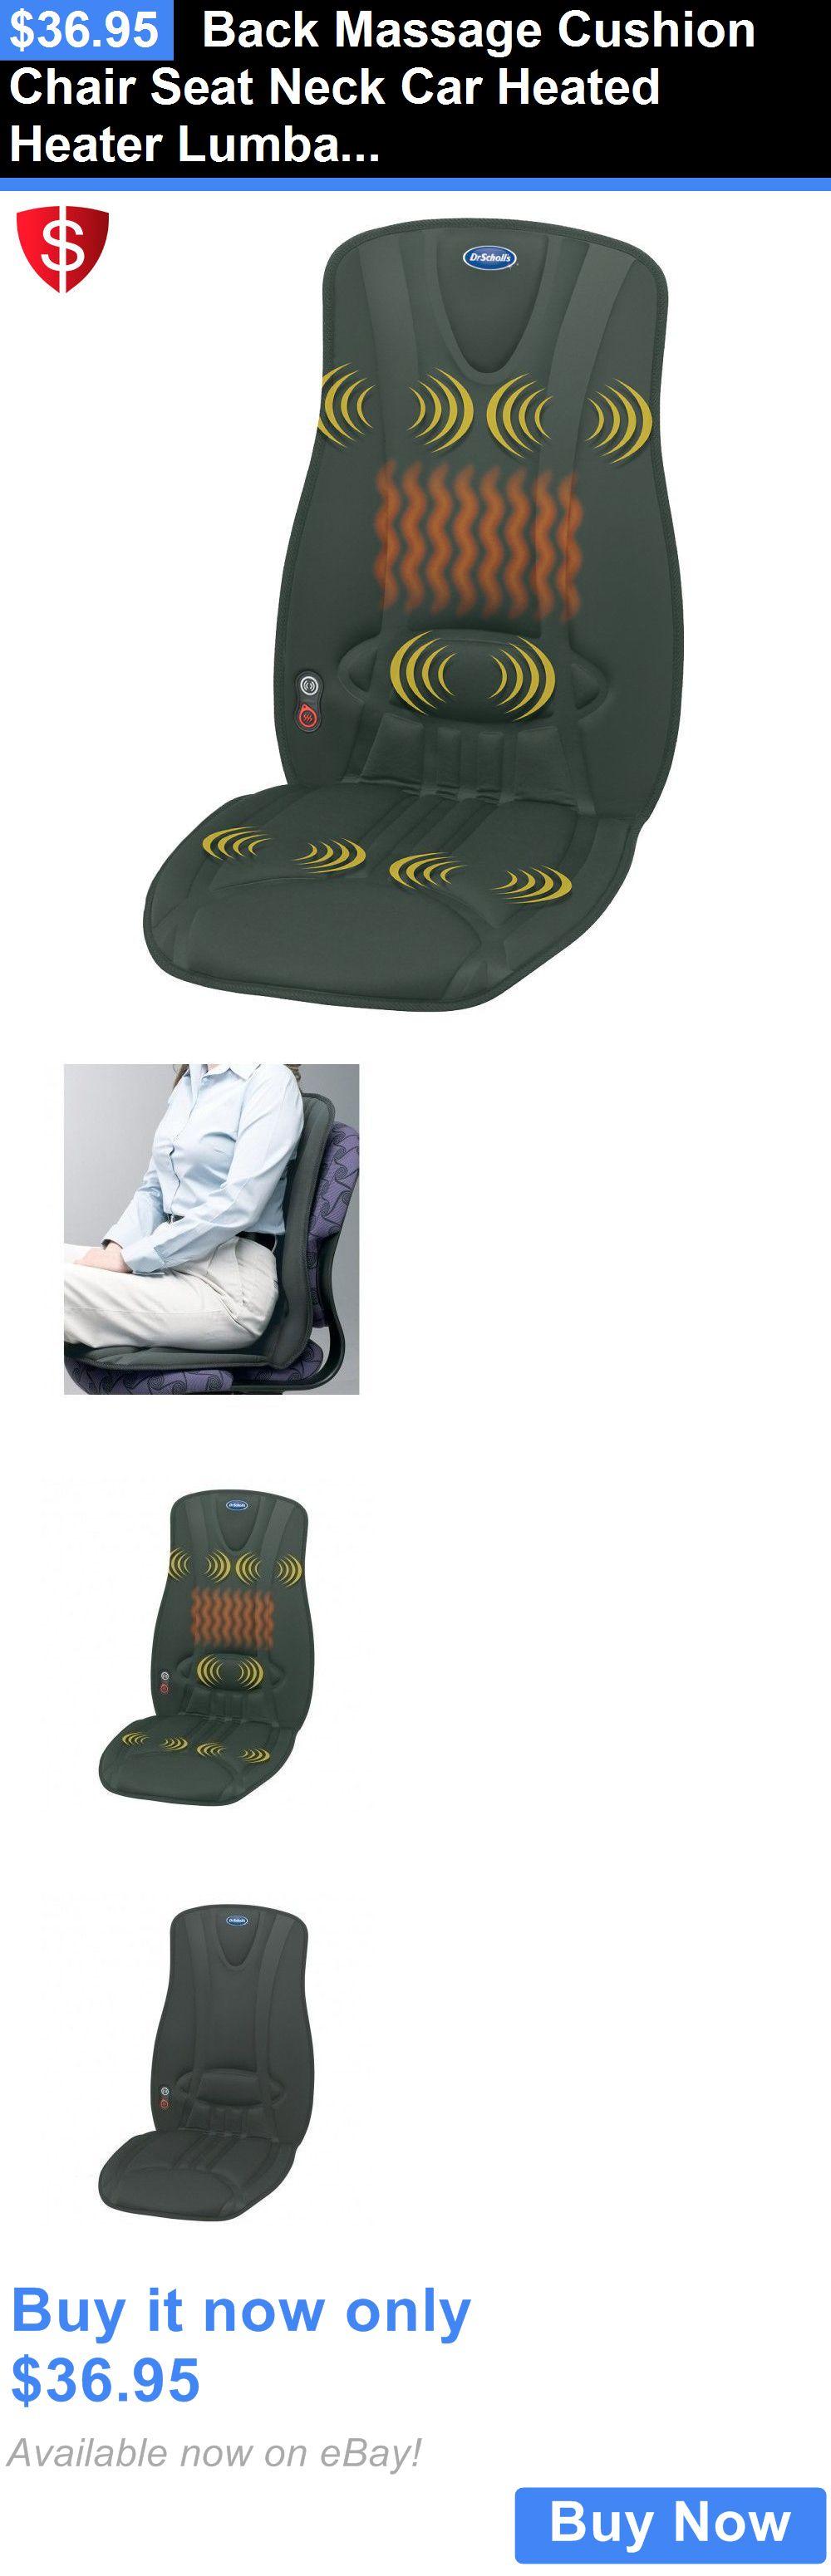 Massagers back massage cushion chair seat neck car heated heater